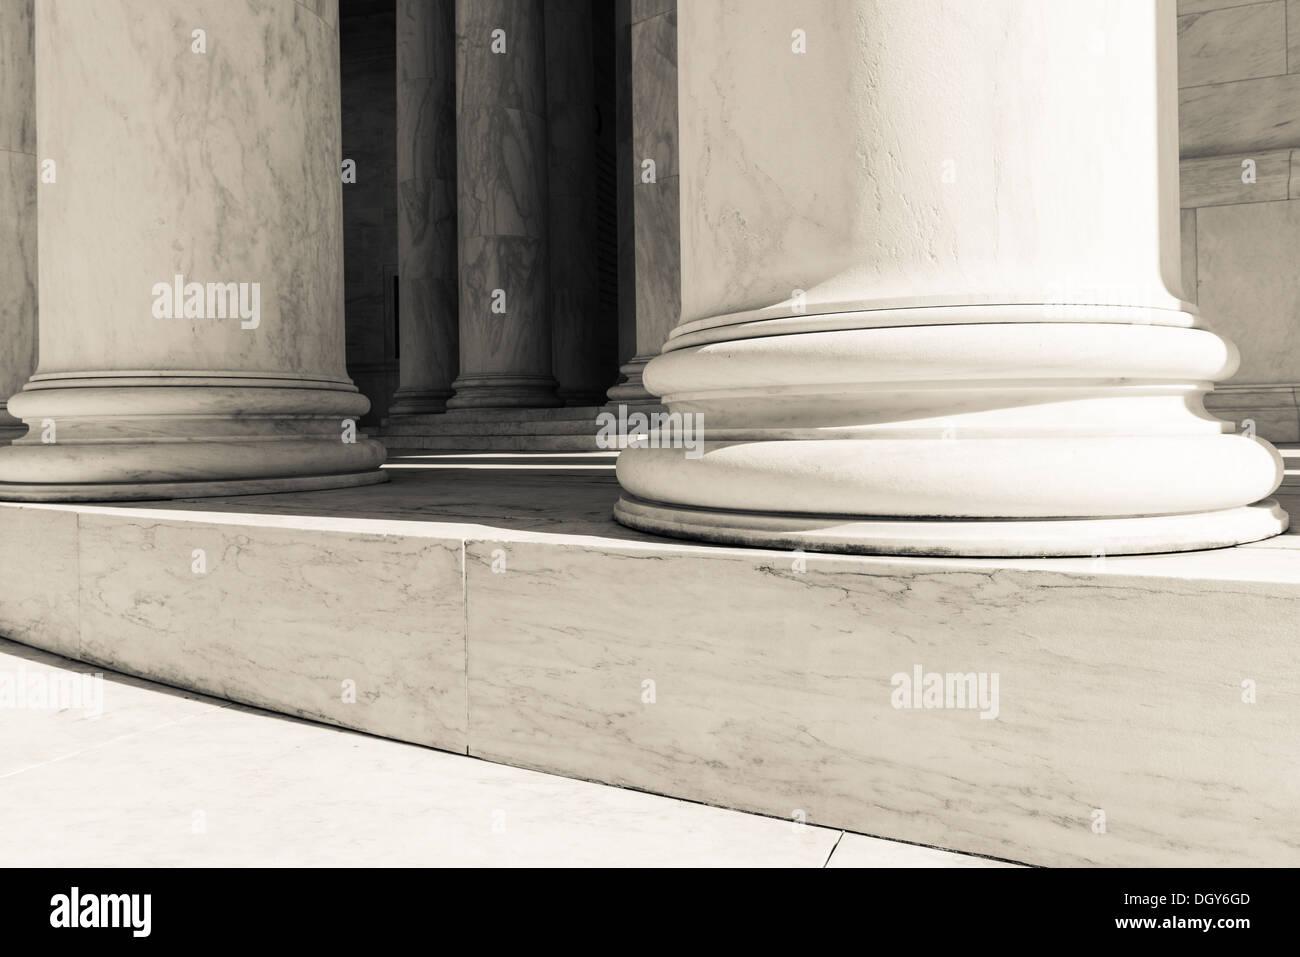 Pillars and Steps - Stock Image